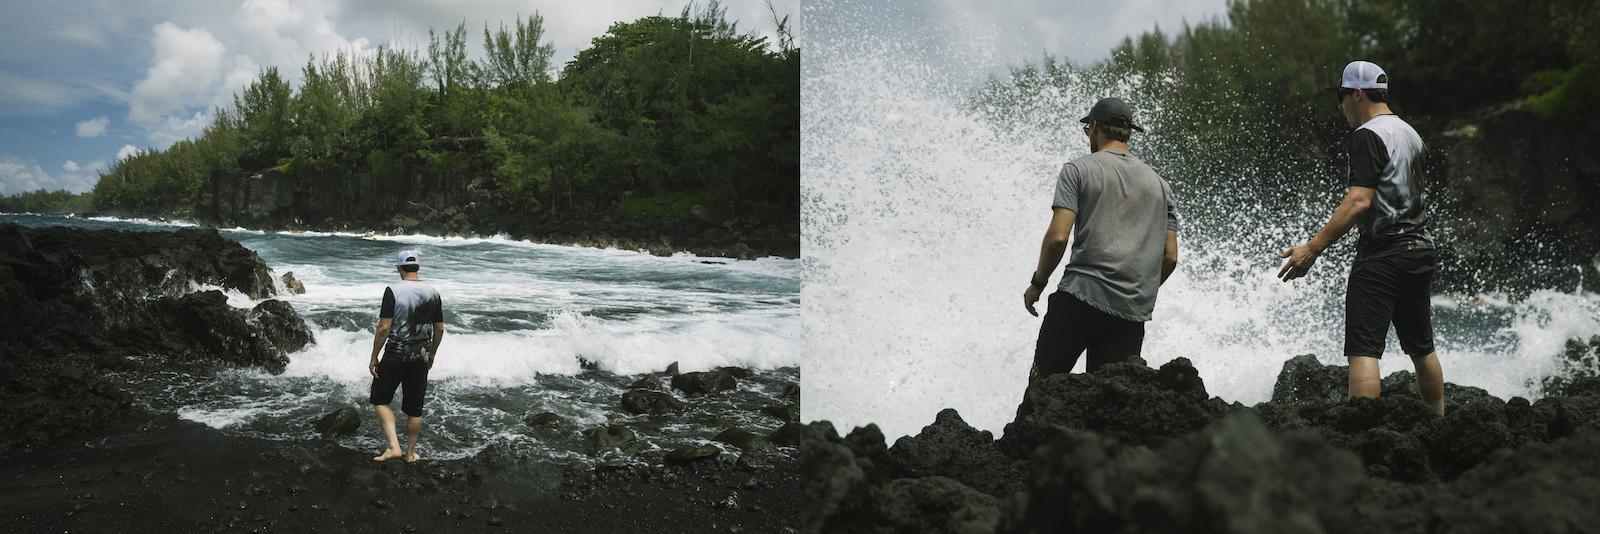 Bryn Atkinson Bas VanSteenbergen David Delassus Theo Booy on Reunion Island Indian Ocean